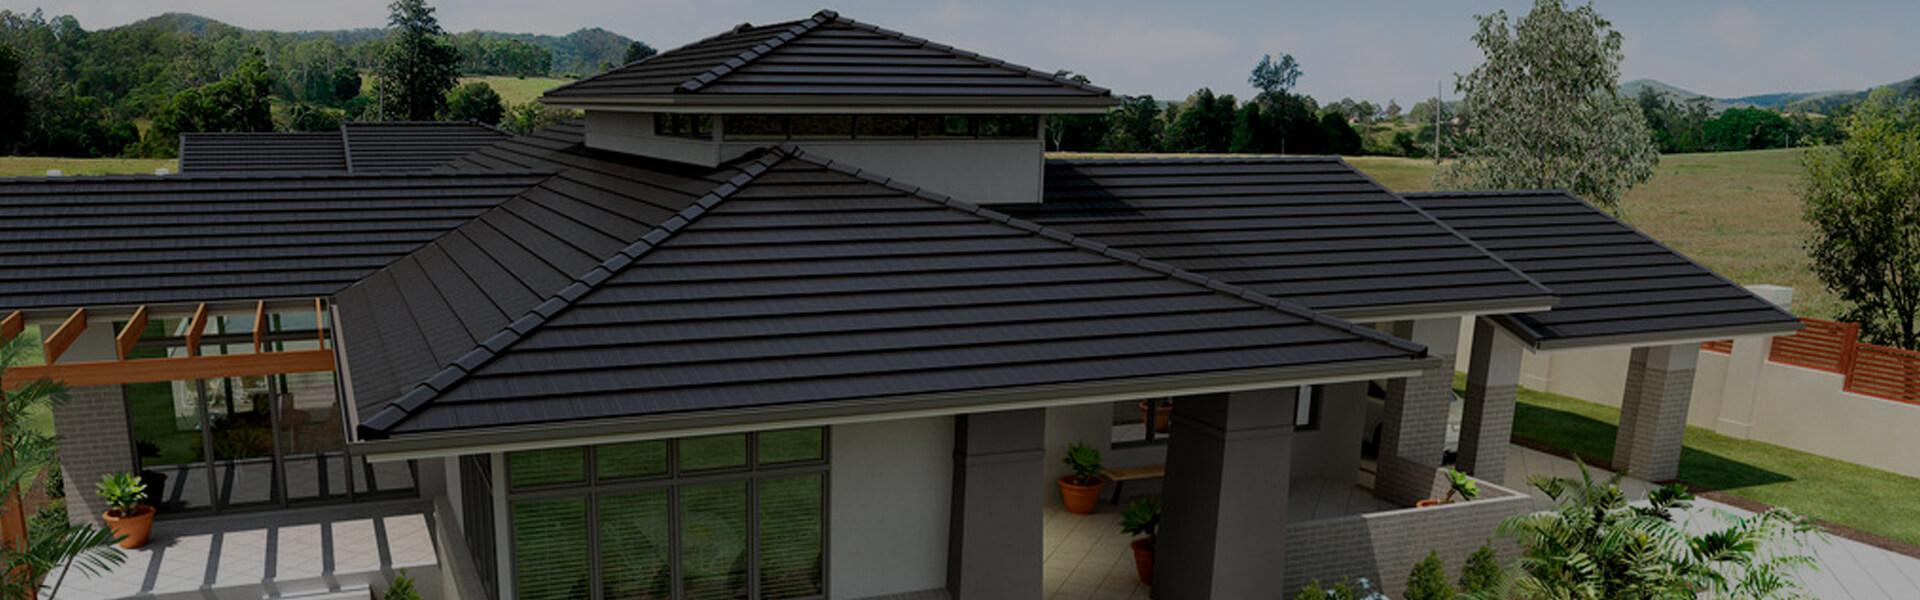 Prestige Roof TIles - Terracotta & Concrete Roofing